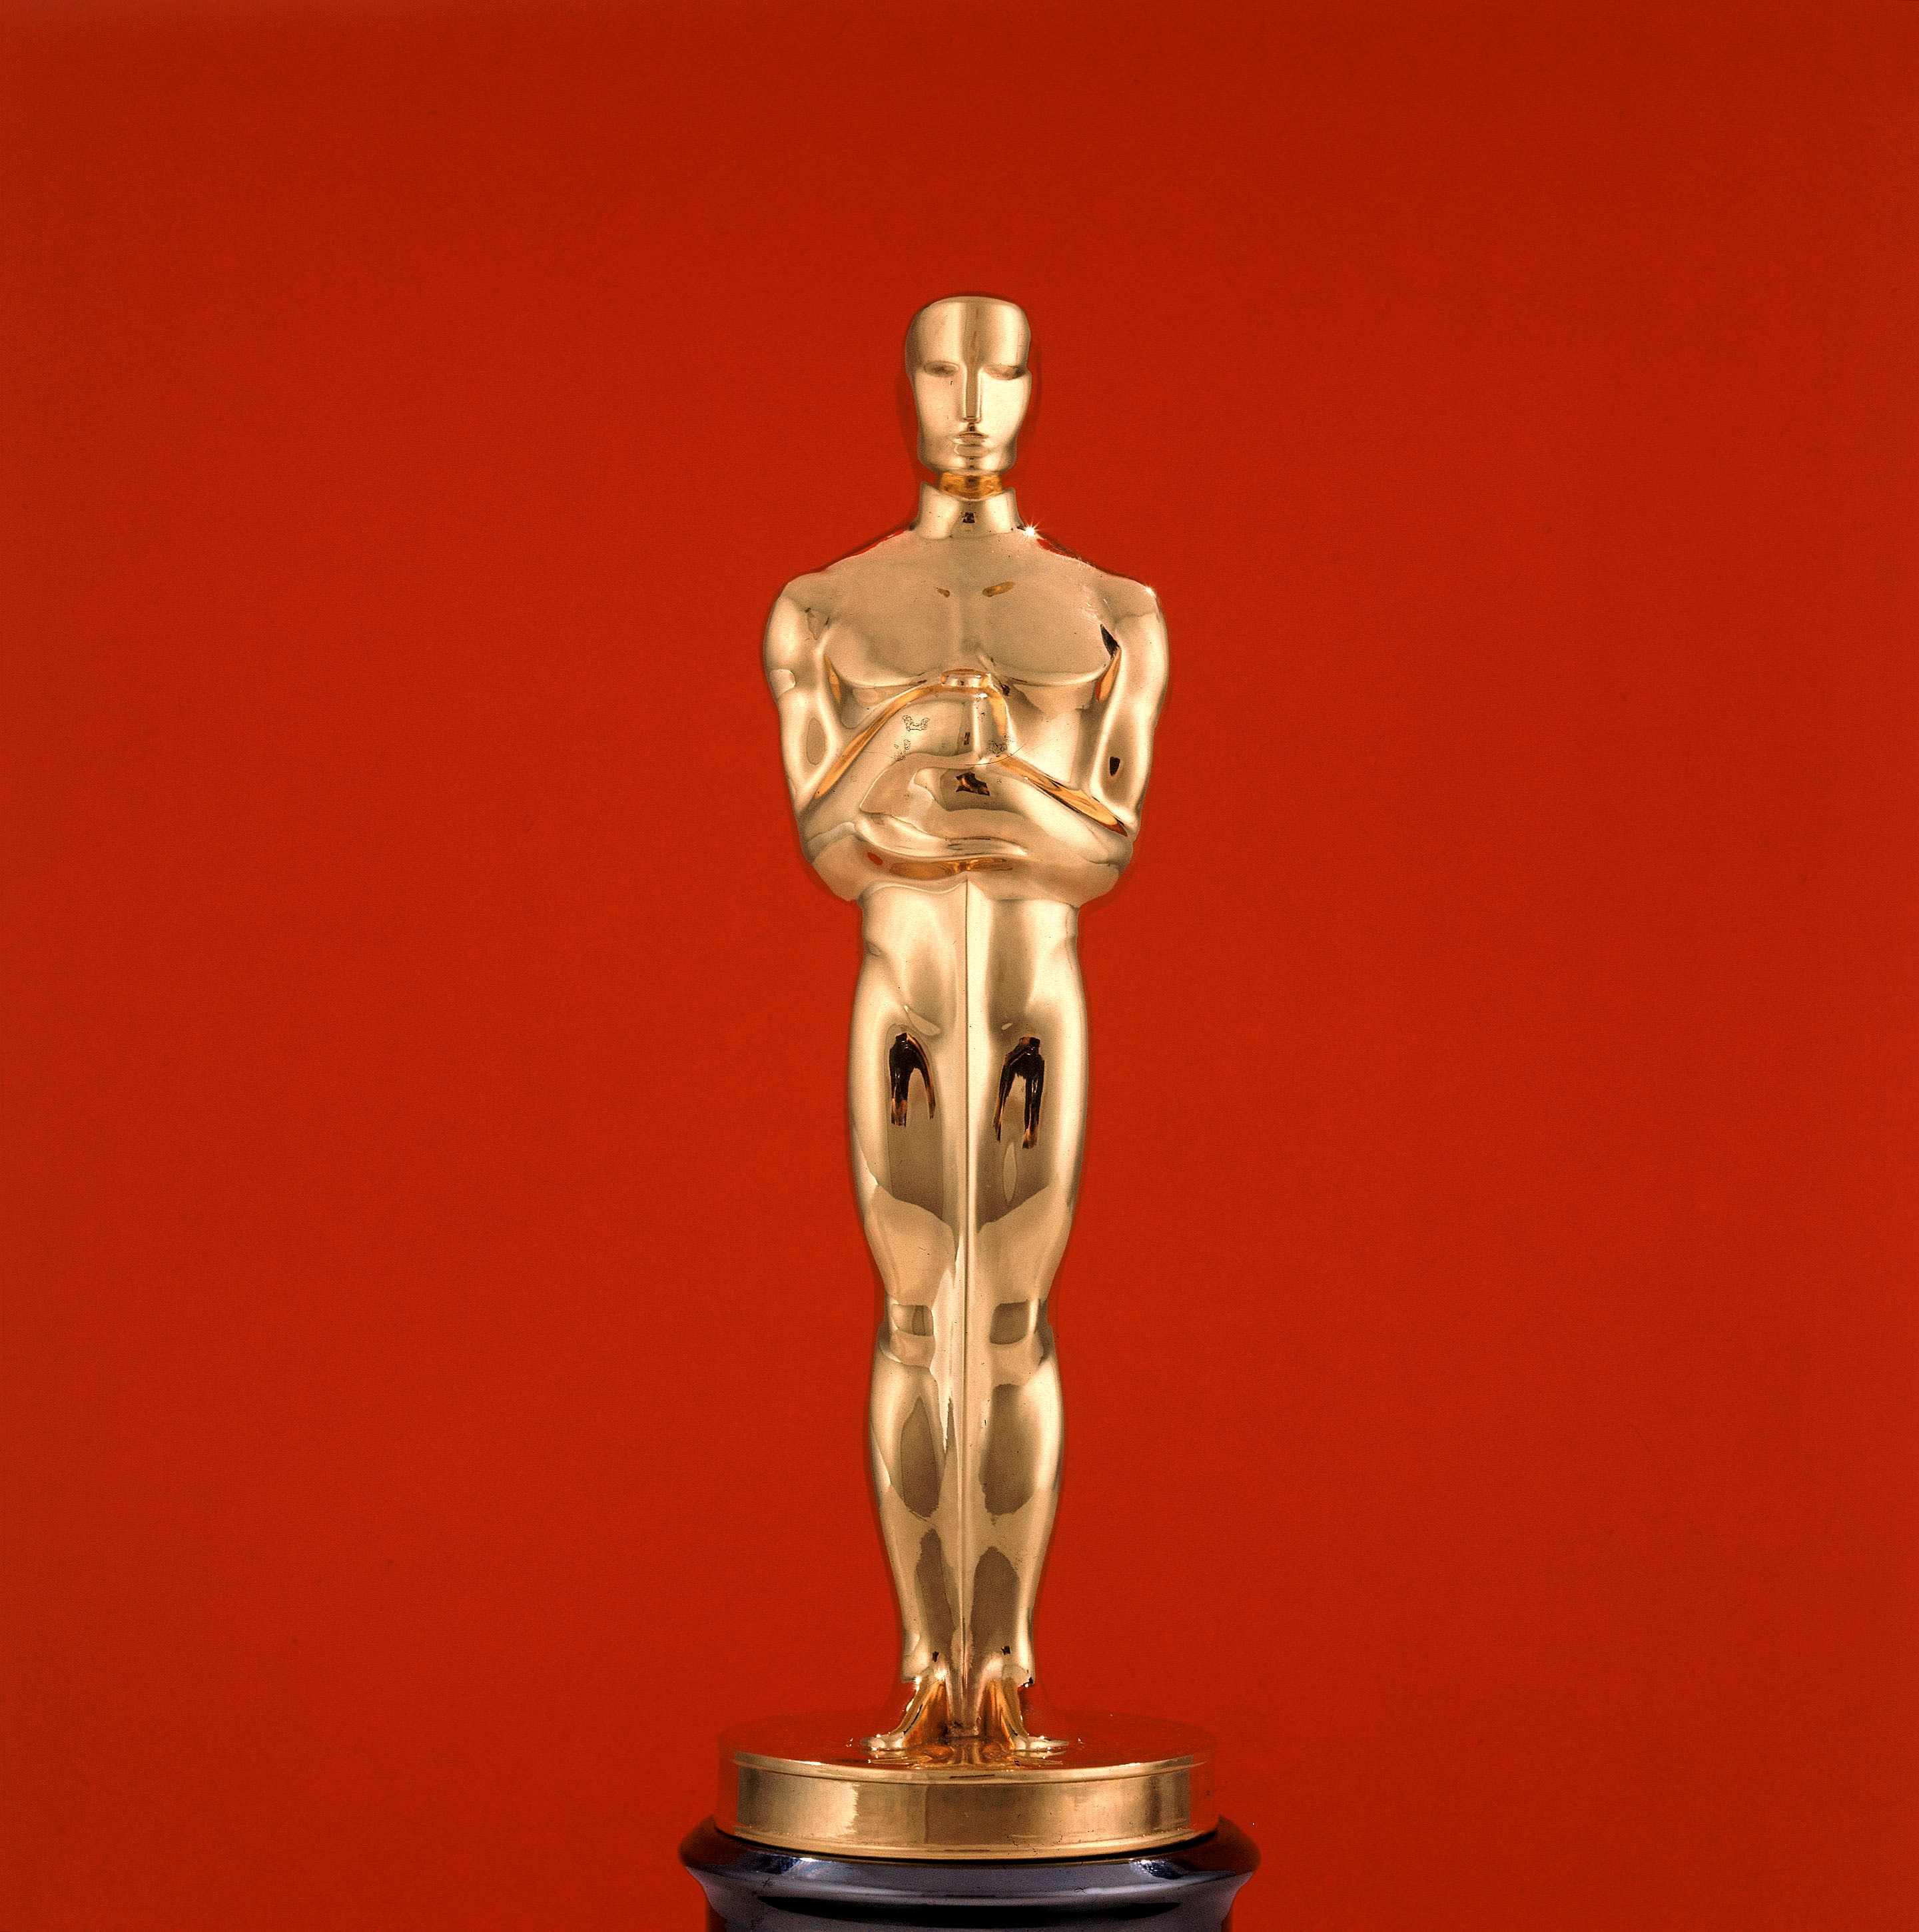 Oscar statuette (Getty, EH)